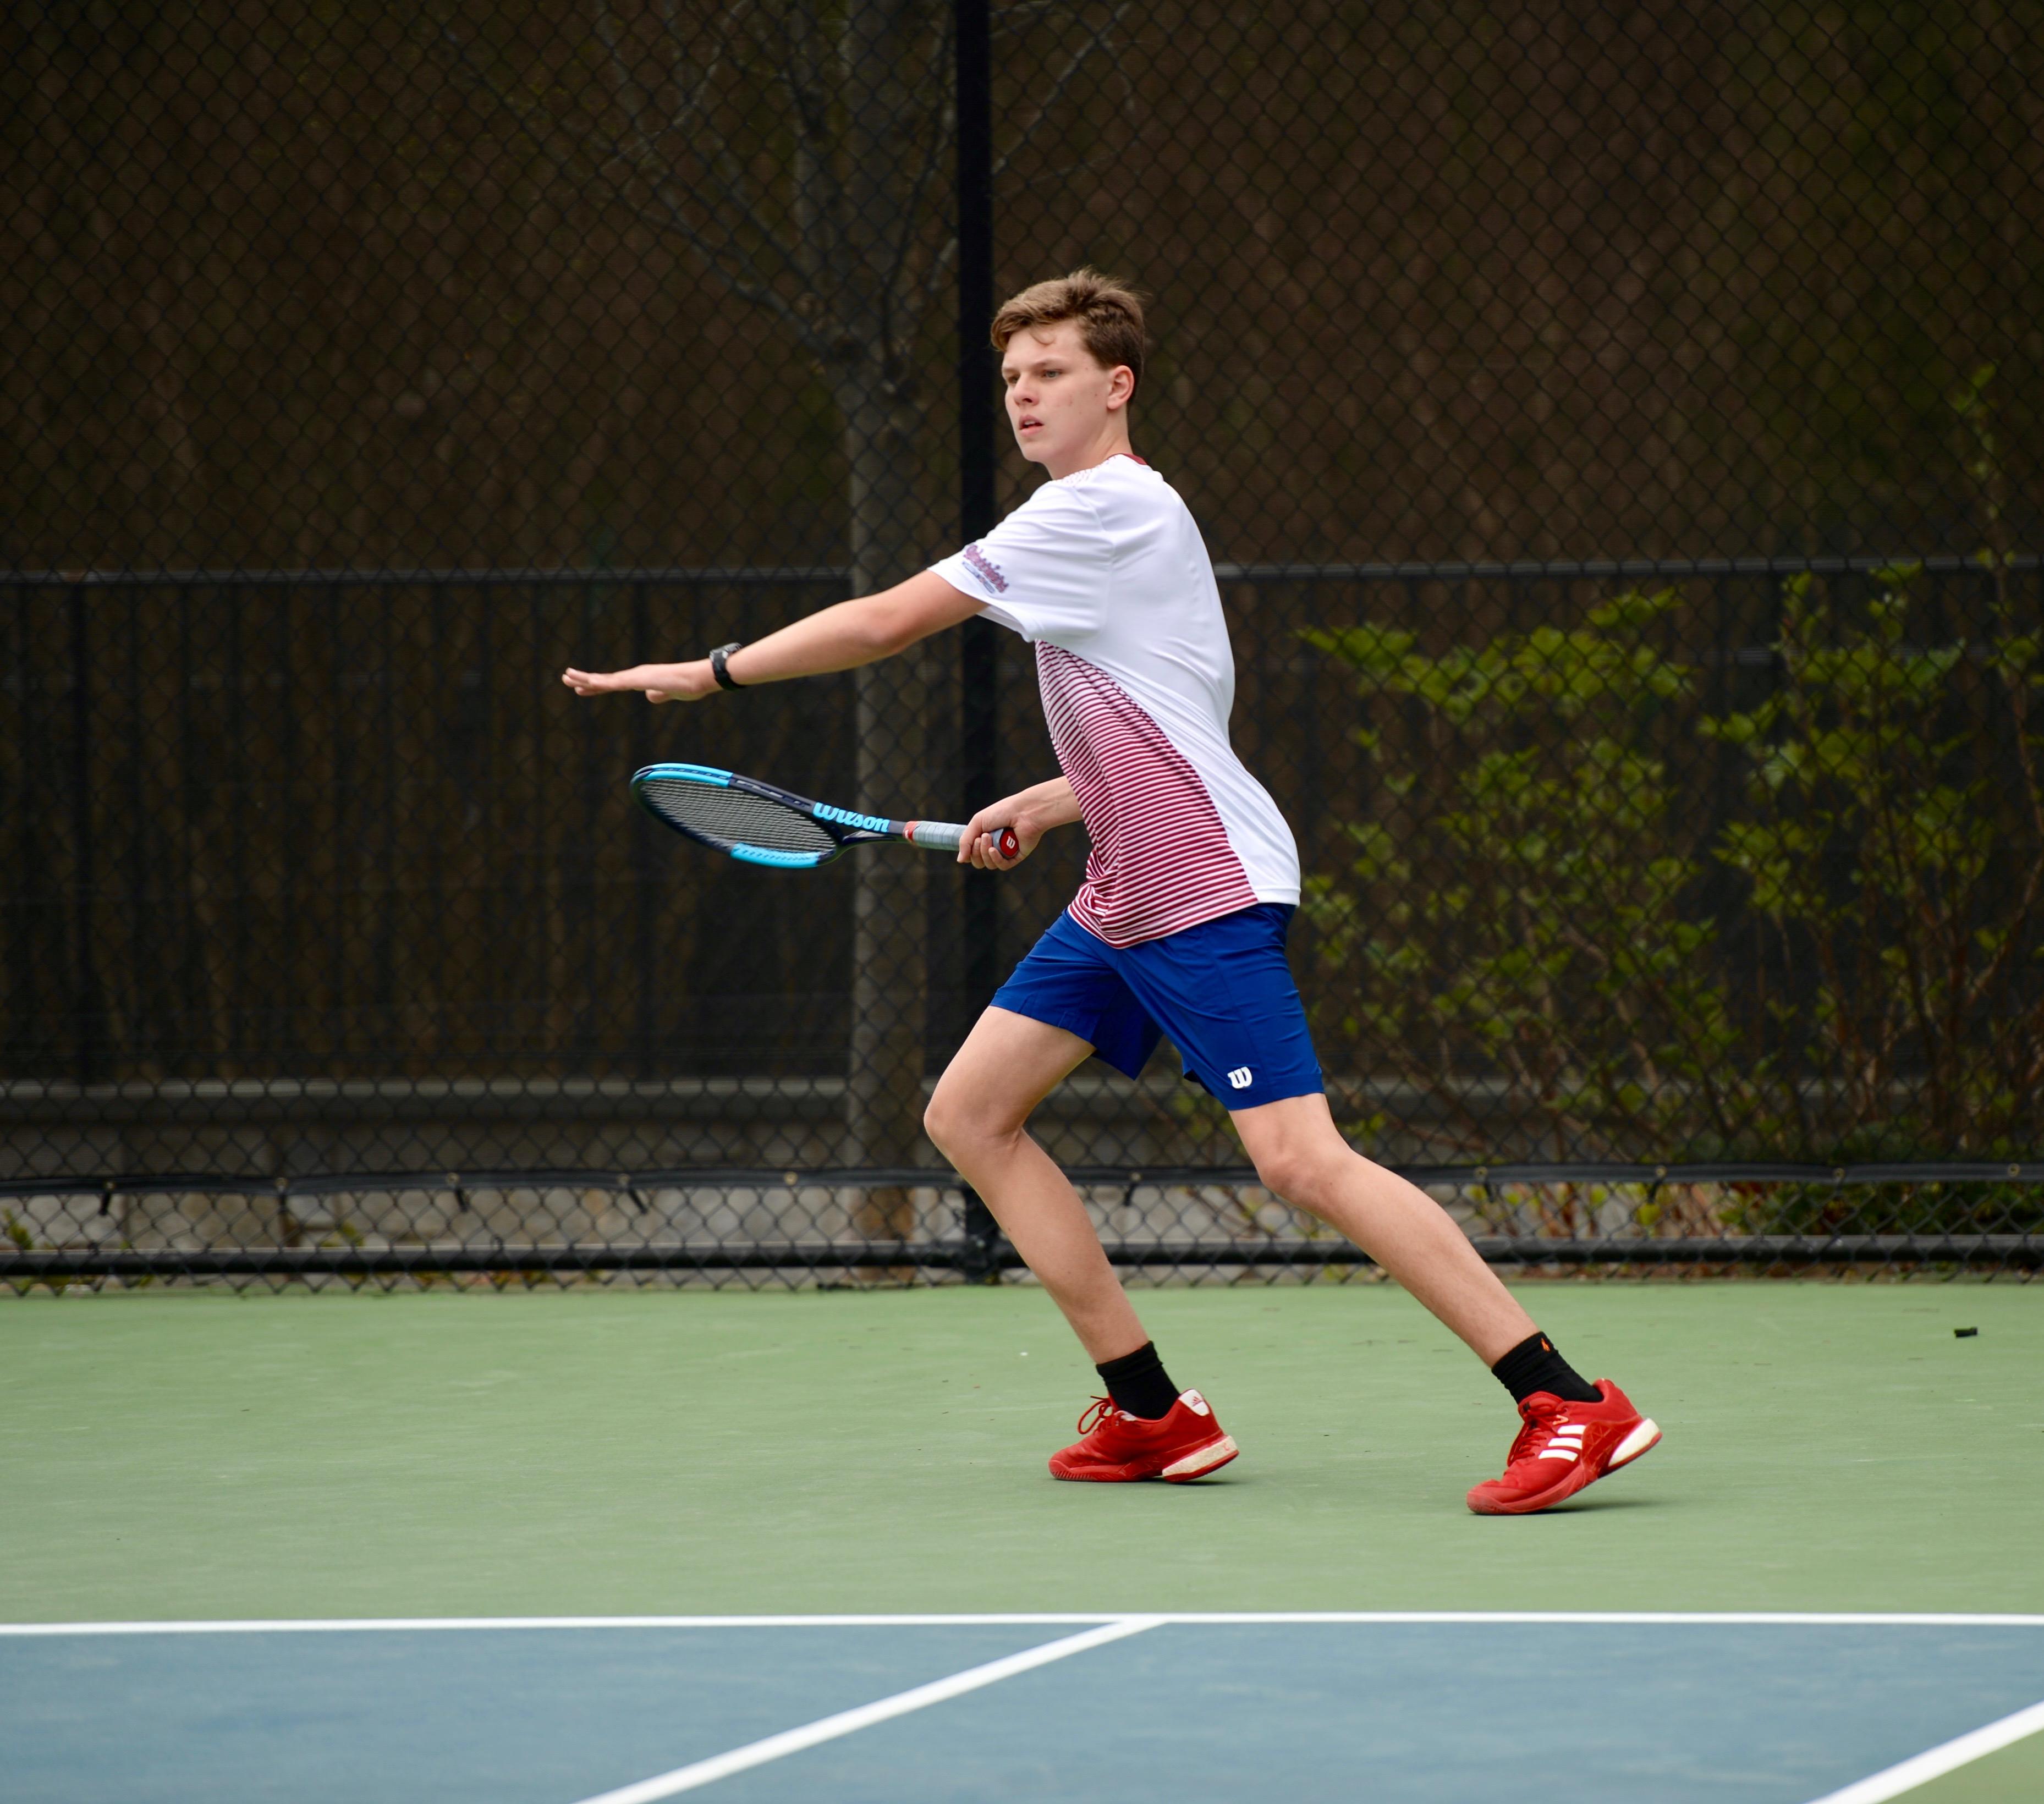 WR tennis march 25 - 1